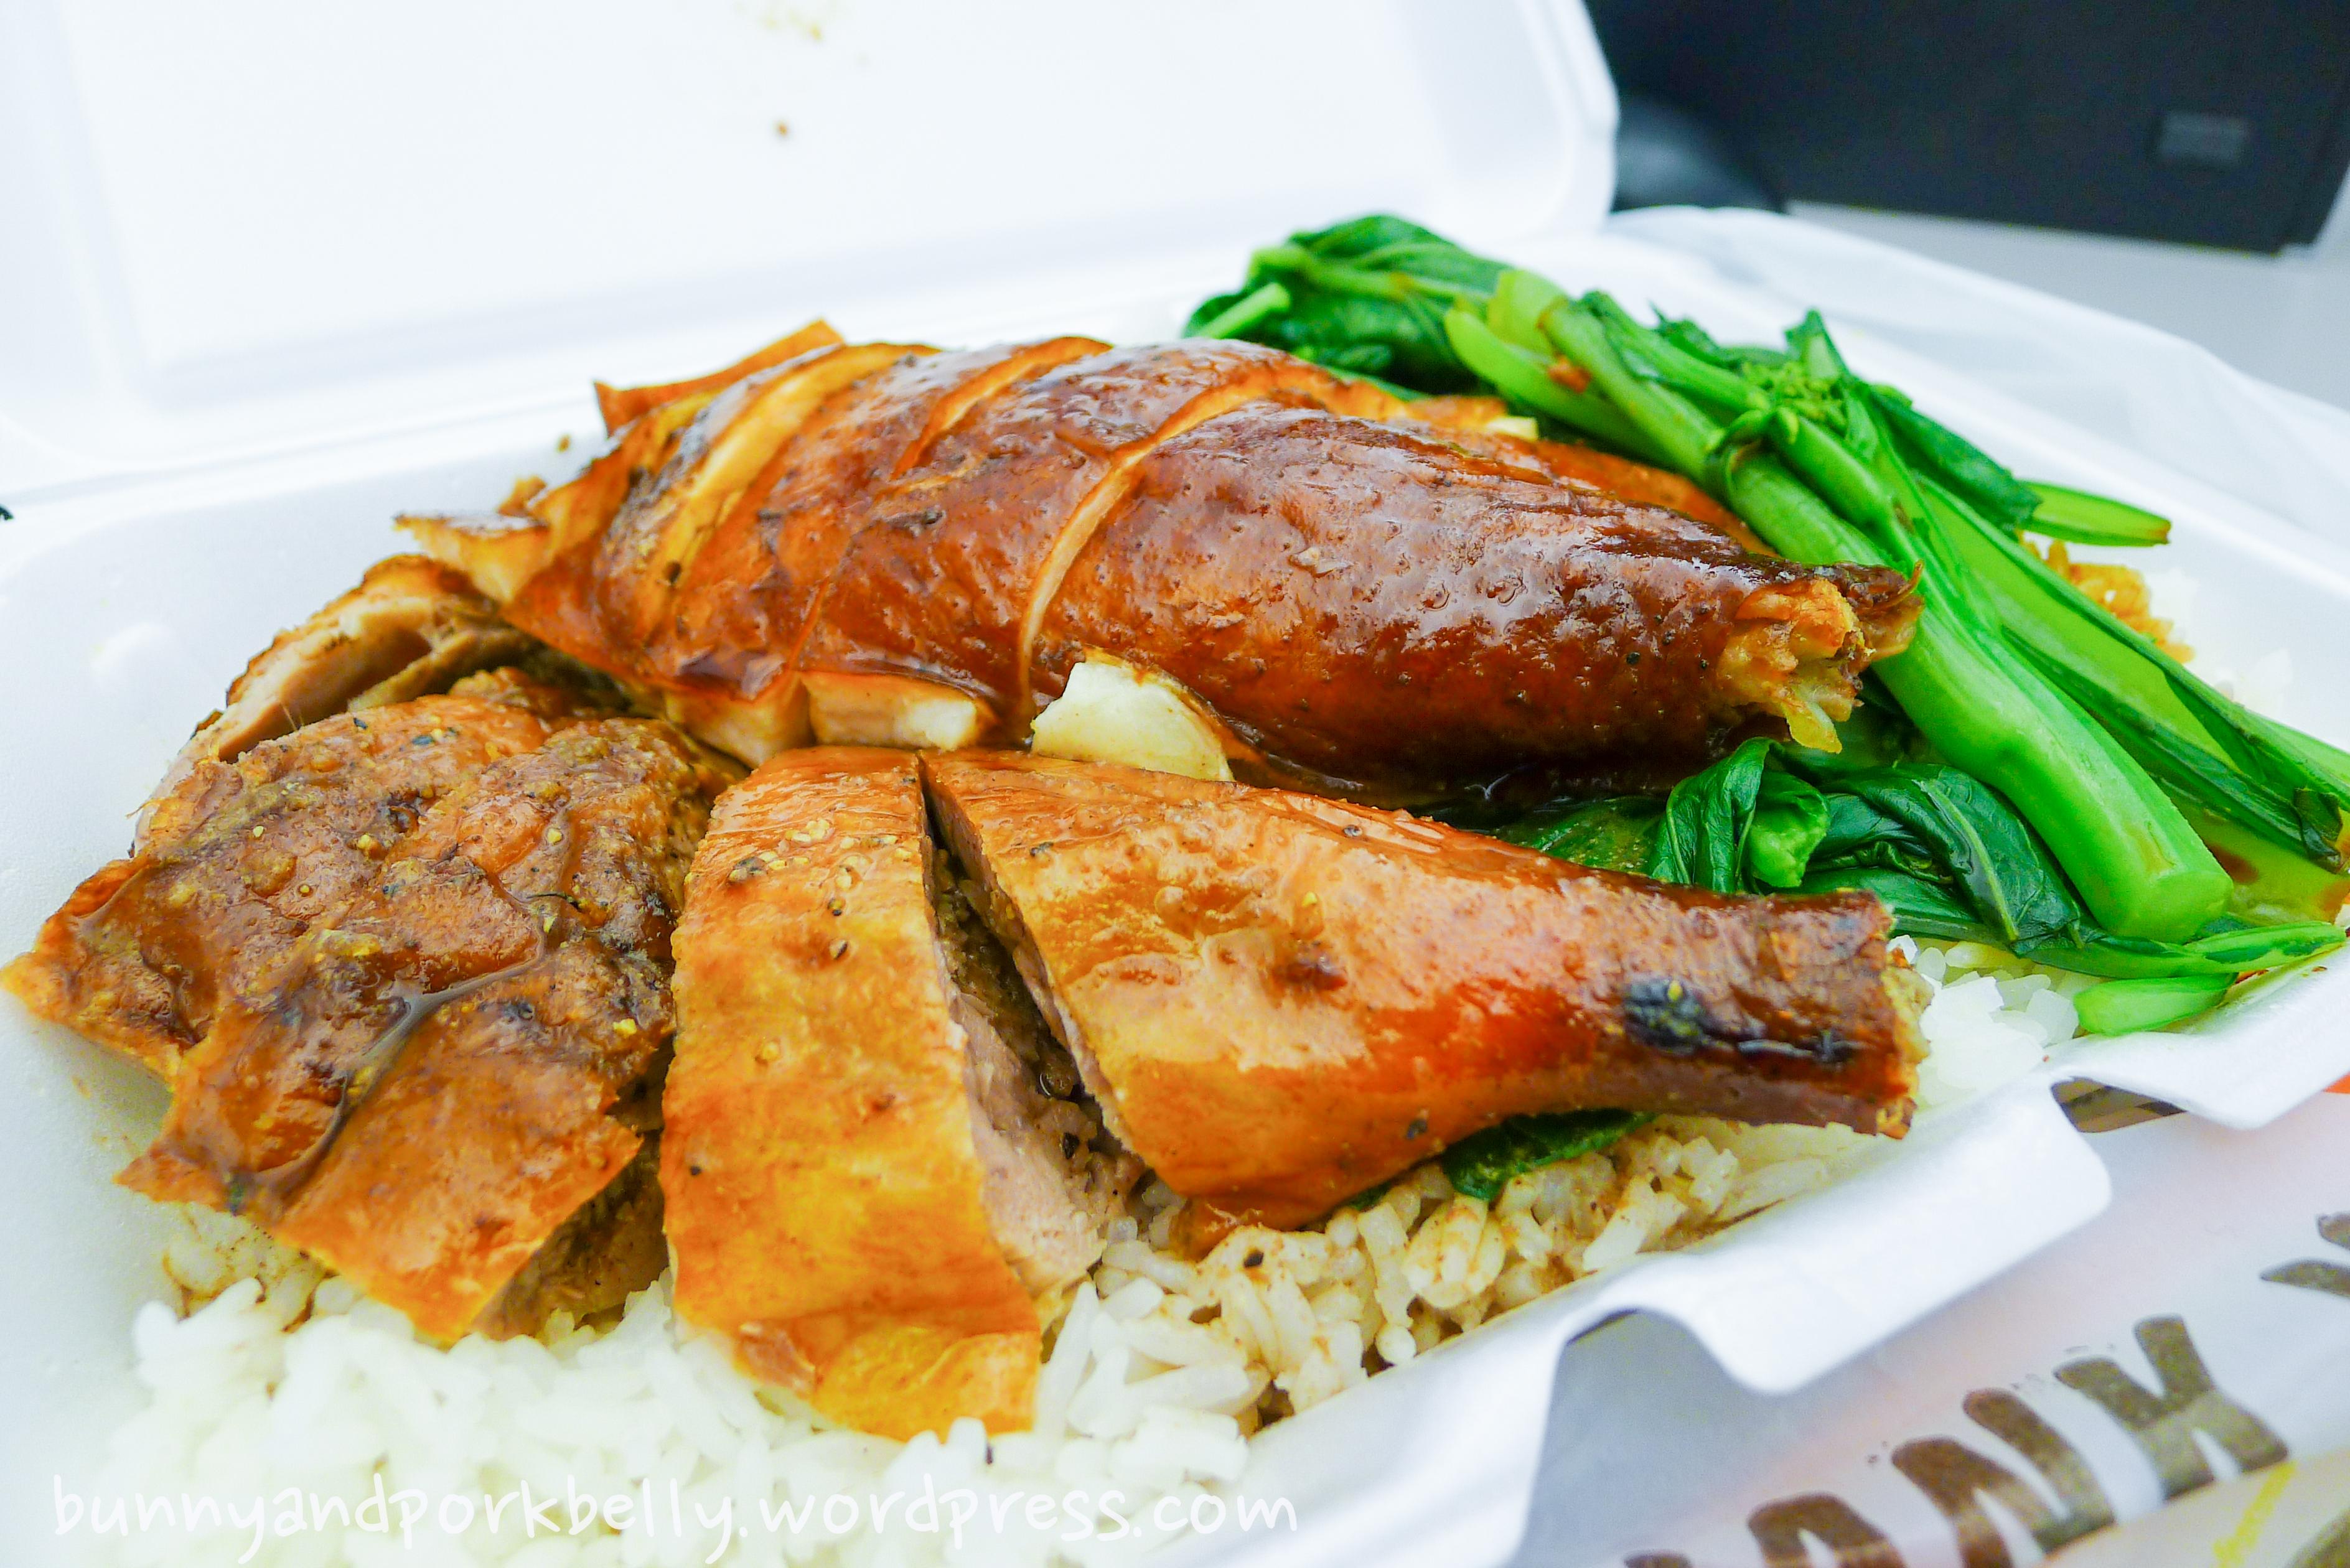 Lunch Vinh Sun Bbq And Restaurant Chinatown Boston Ma